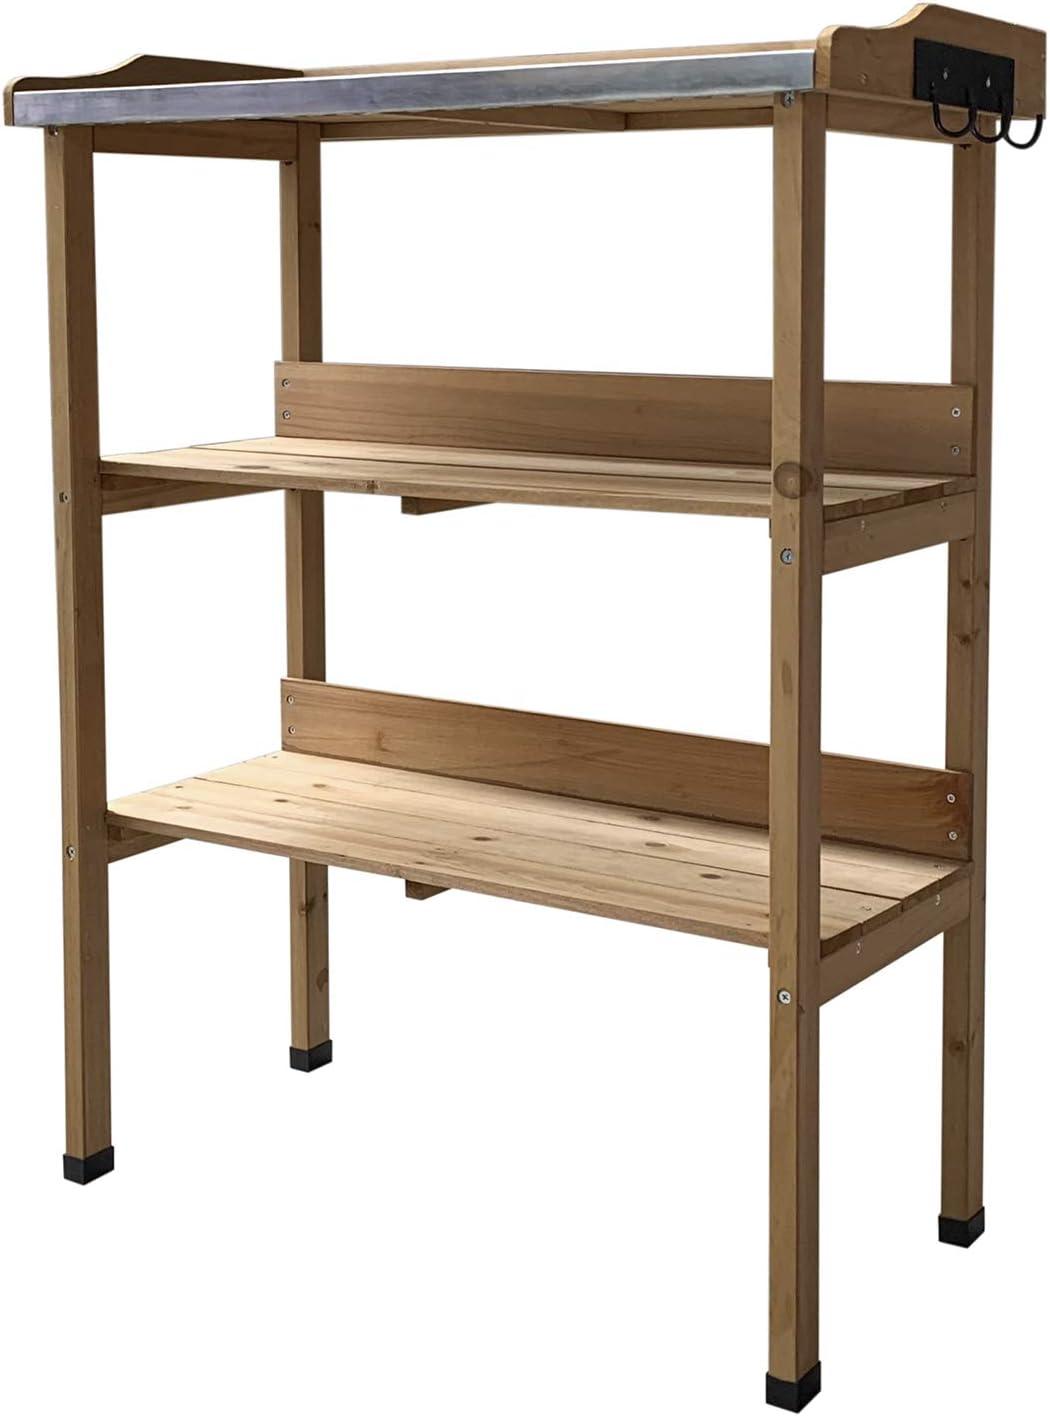 Gardiun KNH1090 - Mesa de trabajo jardinería madera natural Melvin 76x37x89 cm